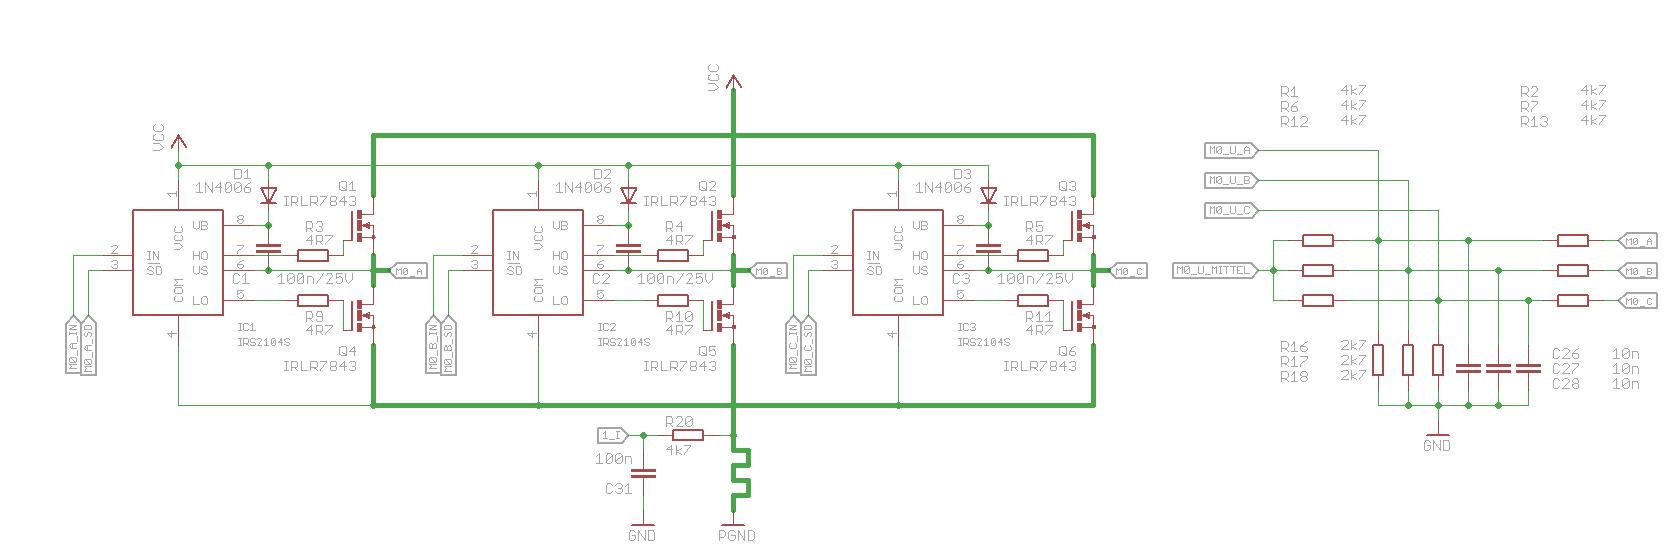 Charmant Elektromotor Schaltung Fotos - Schaltplan Serie Circuit ...